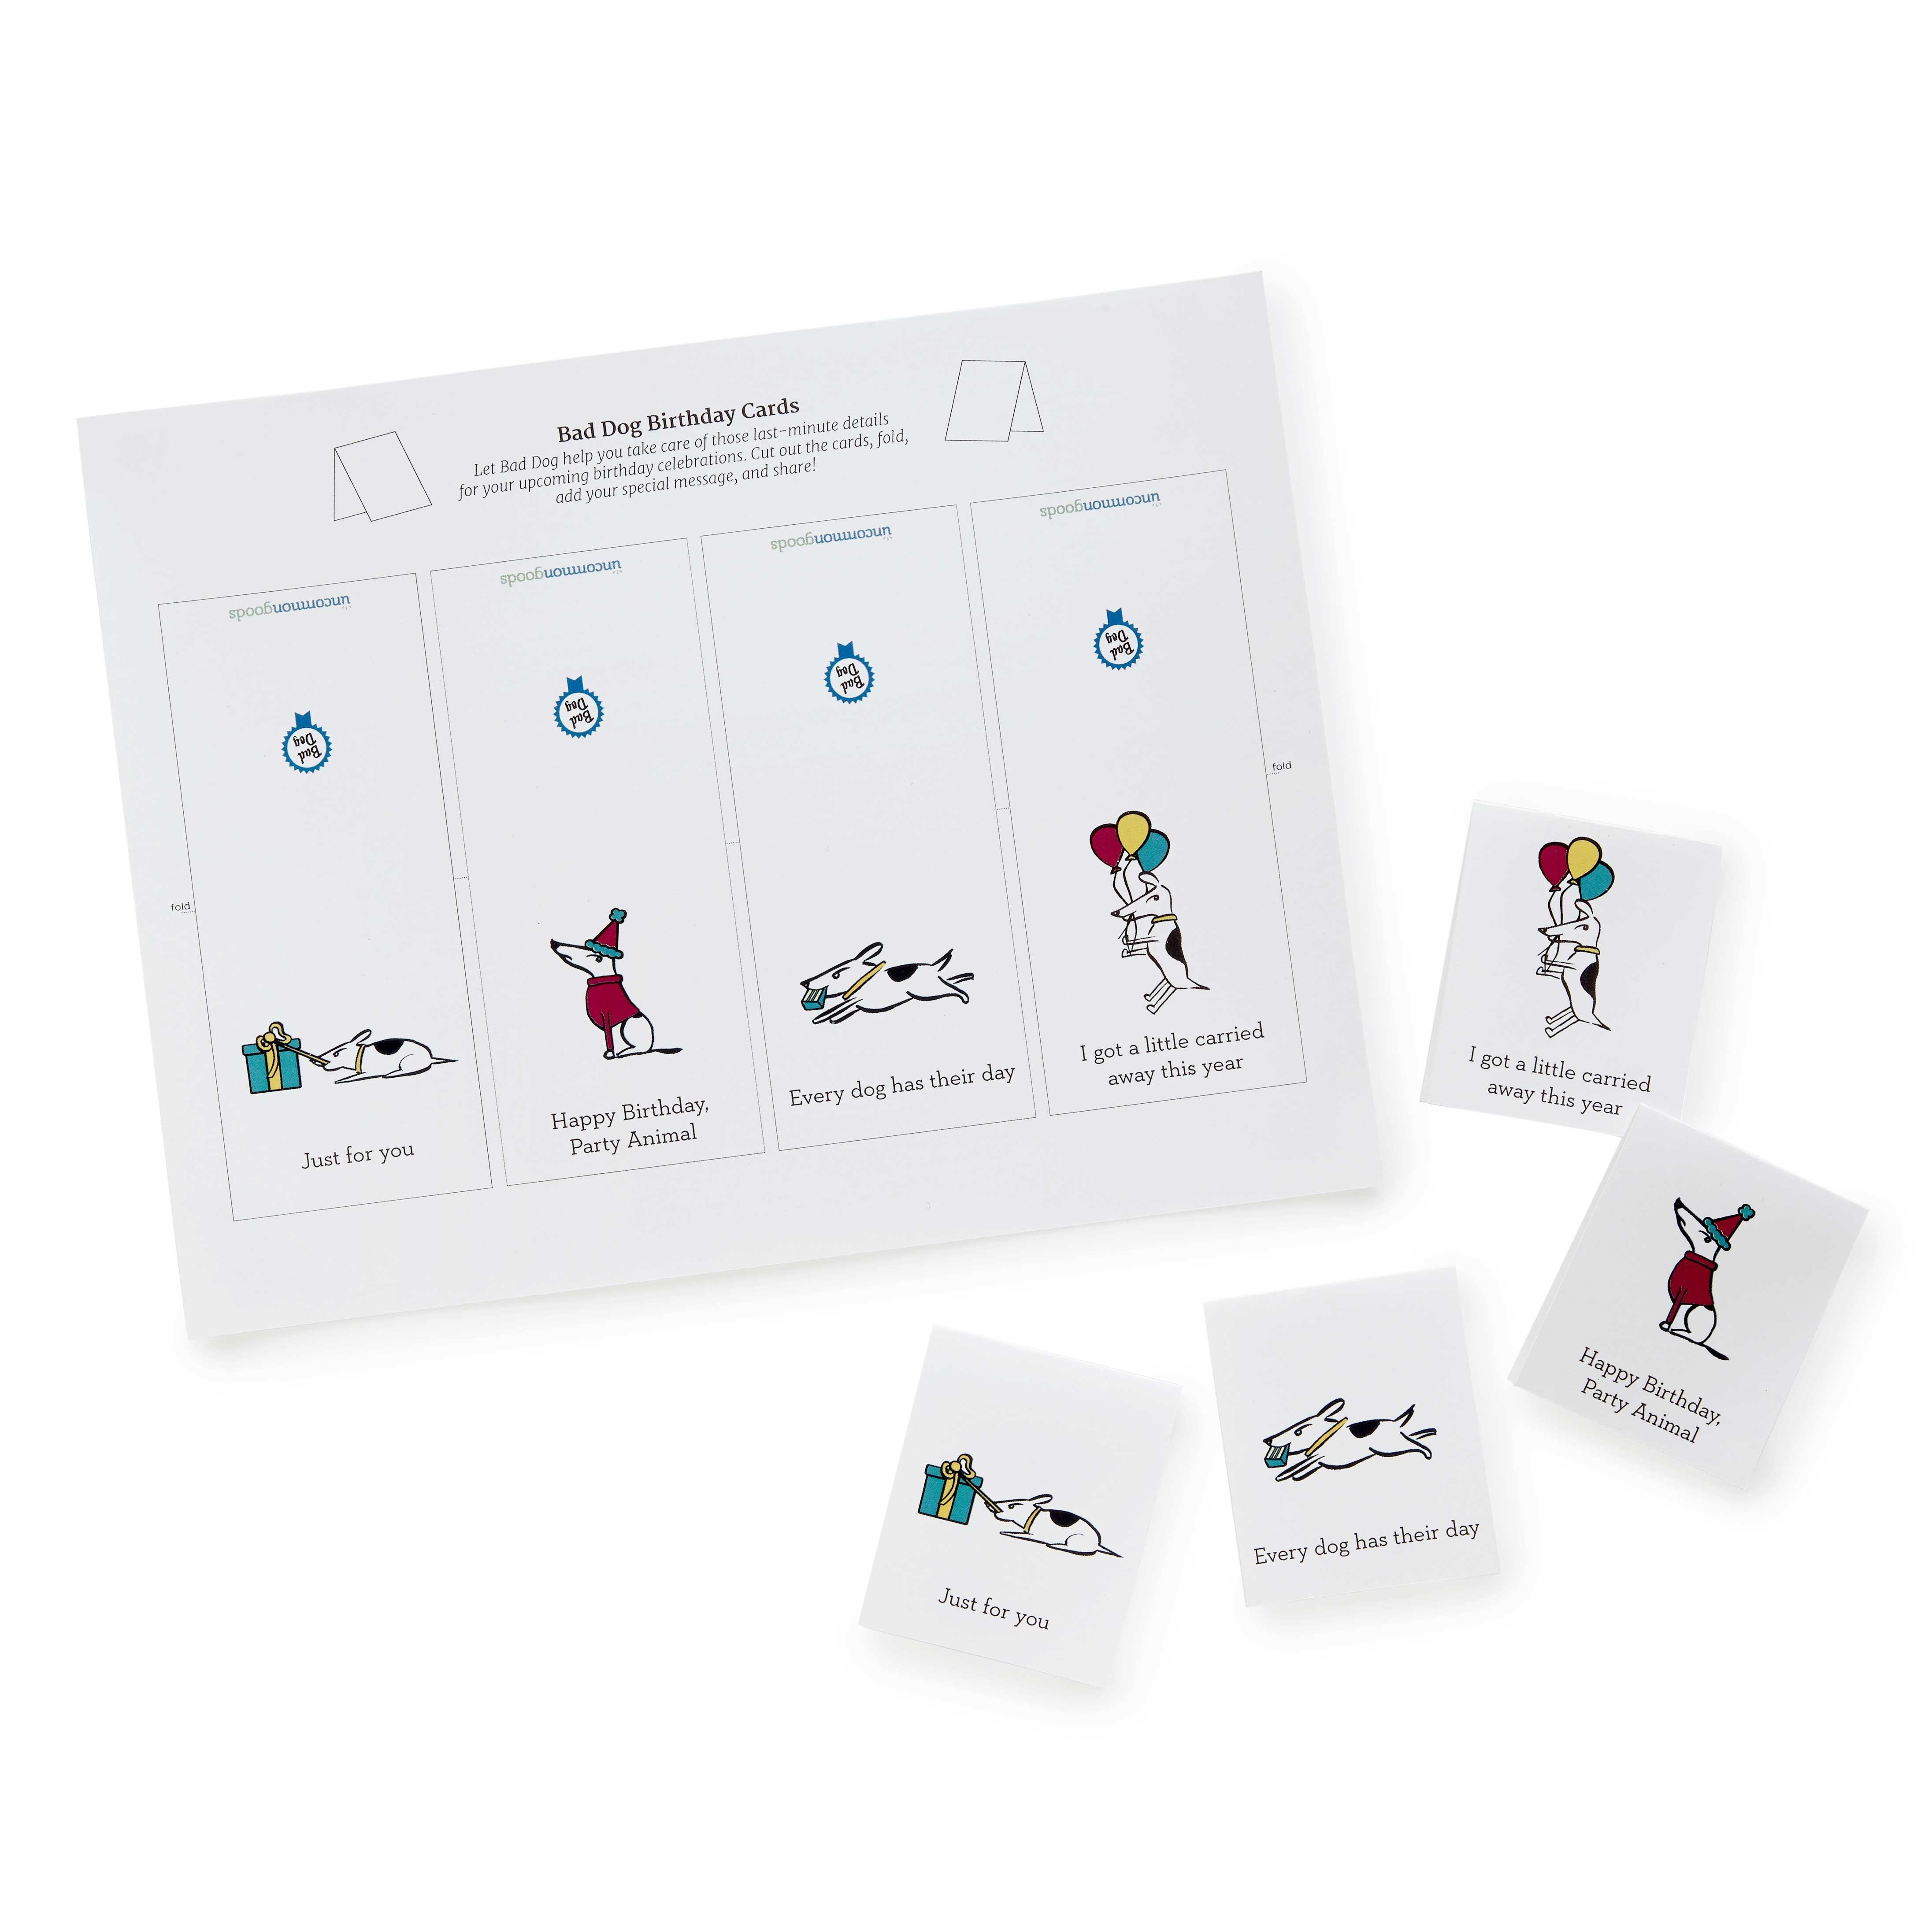 Printable Bad Dog Birthday Cards | Downloadable Cards | Uncommongoods - Free Printable Dr Who Birthday Card